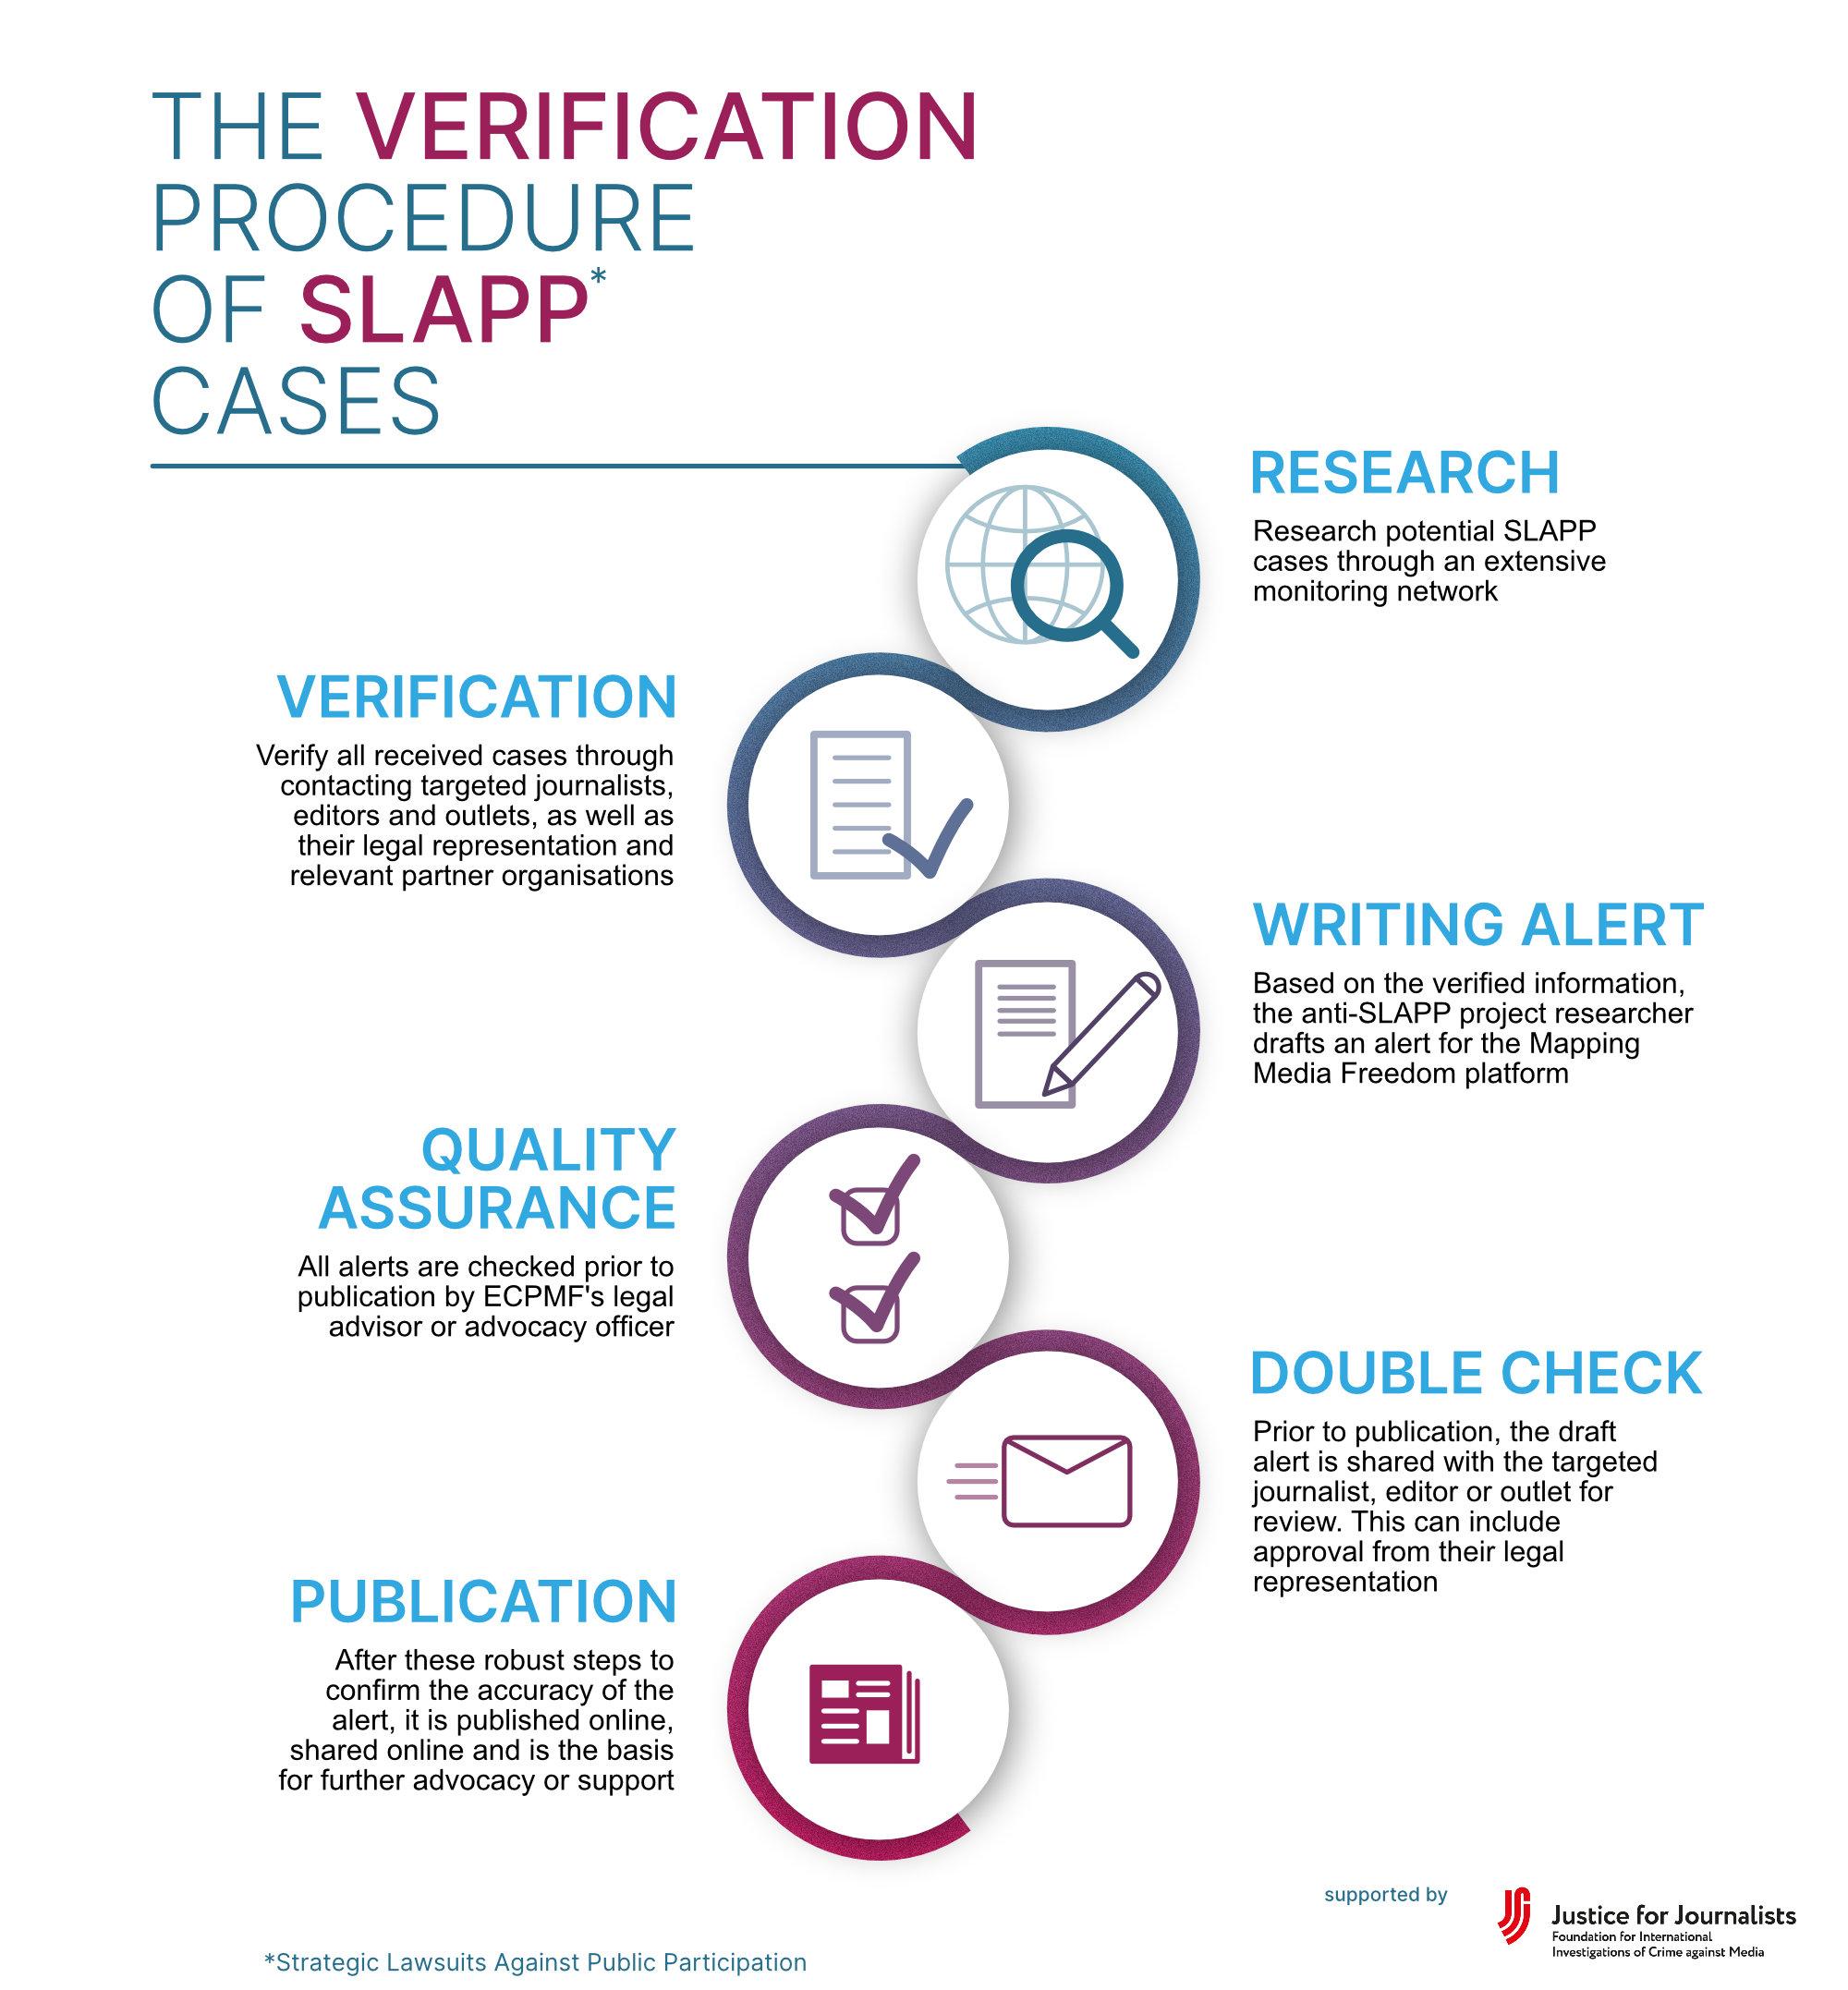 ECPMF's Verification Procedure of SLAPP cases